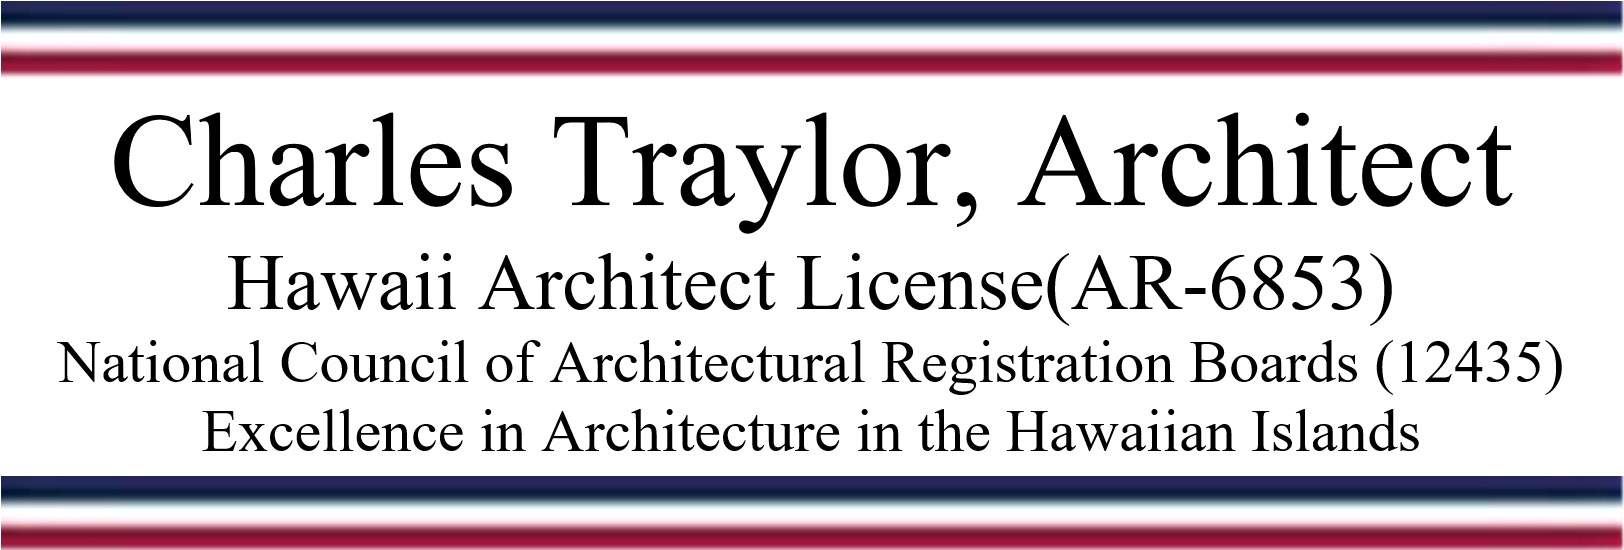 Charles Traylor, Architect